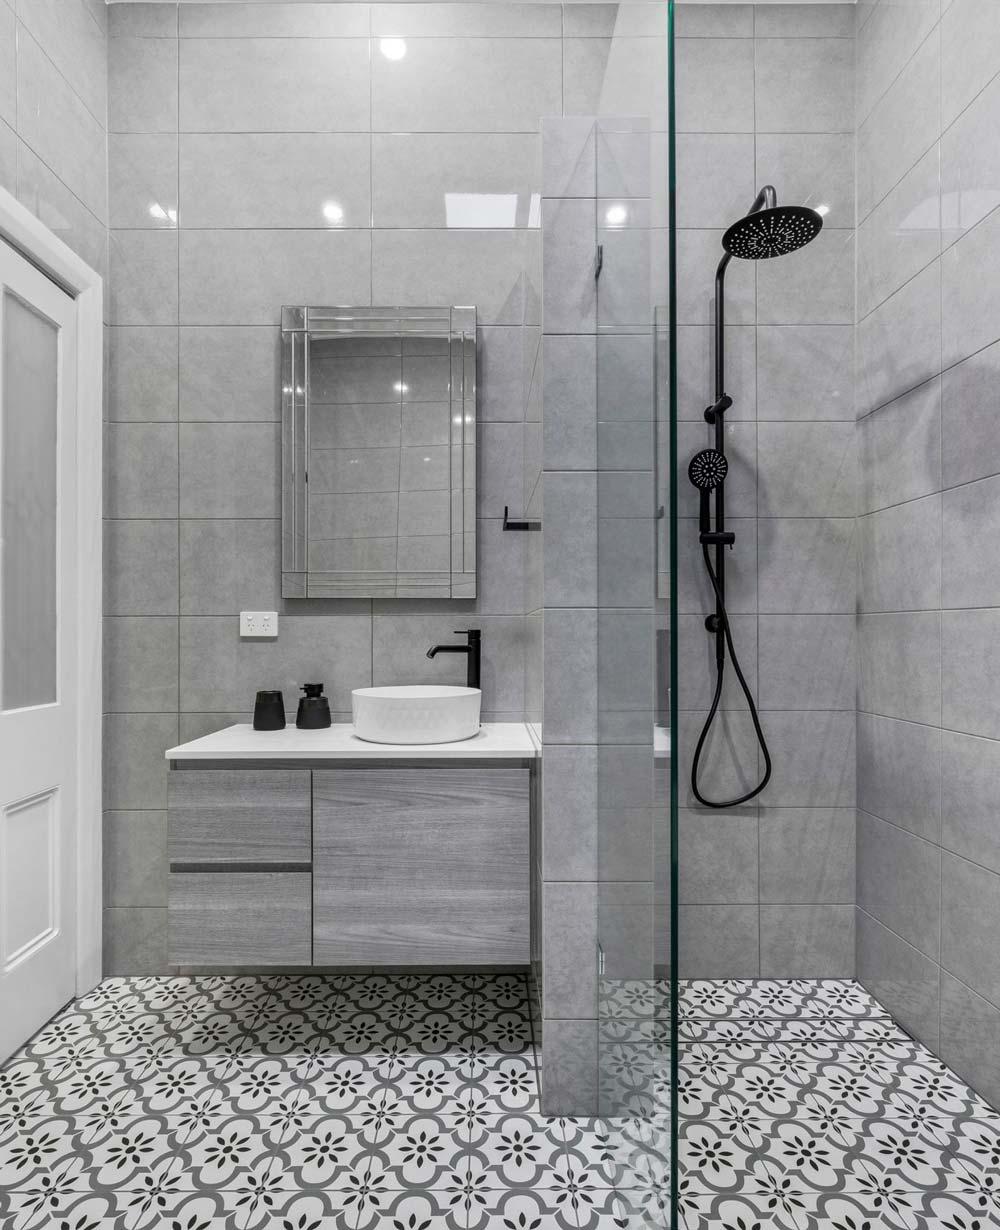 Adelaide home bathroom renovation after image